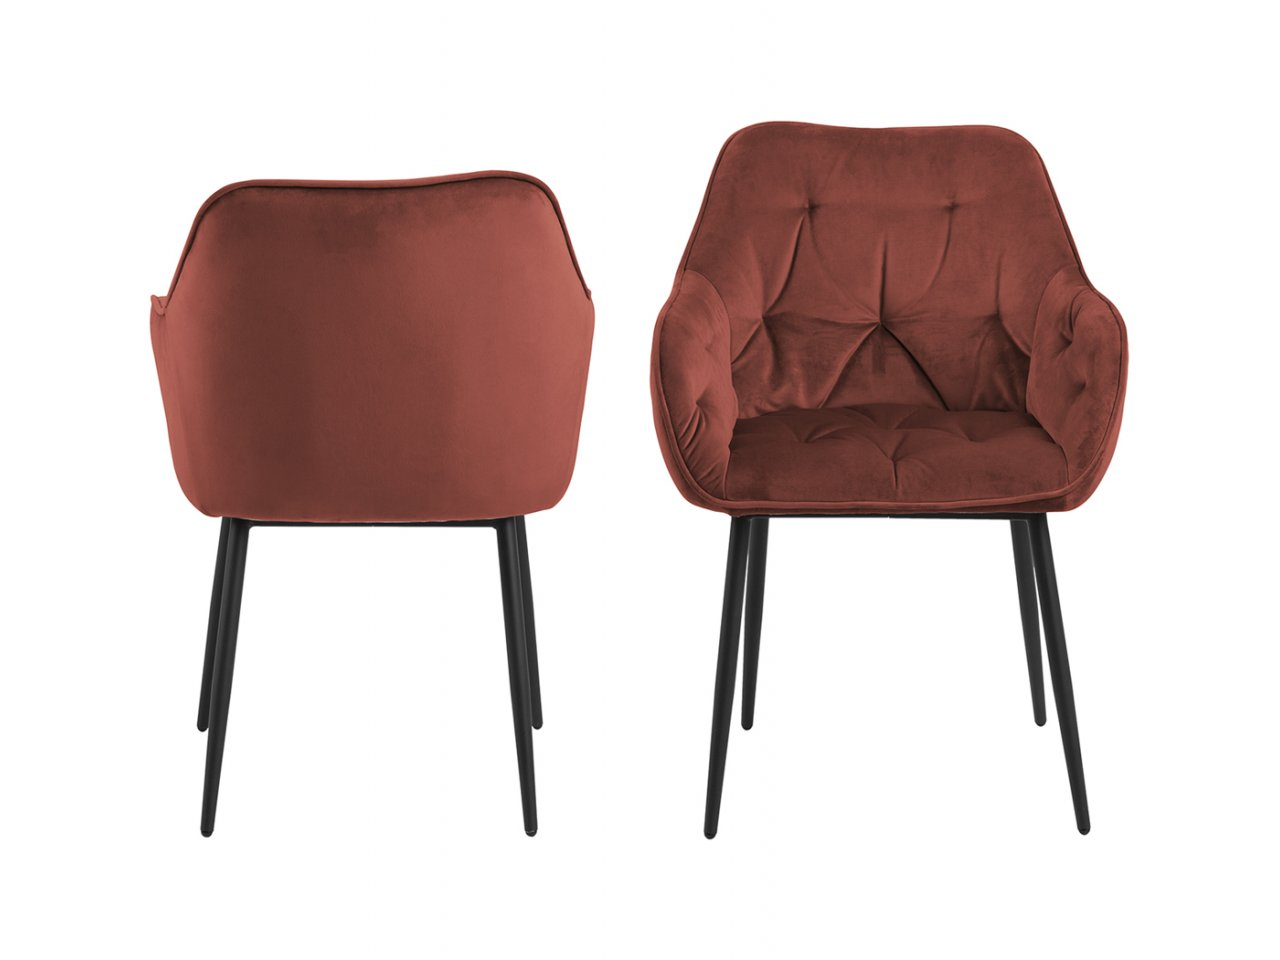 Sedia con braccioli Poffabro -4